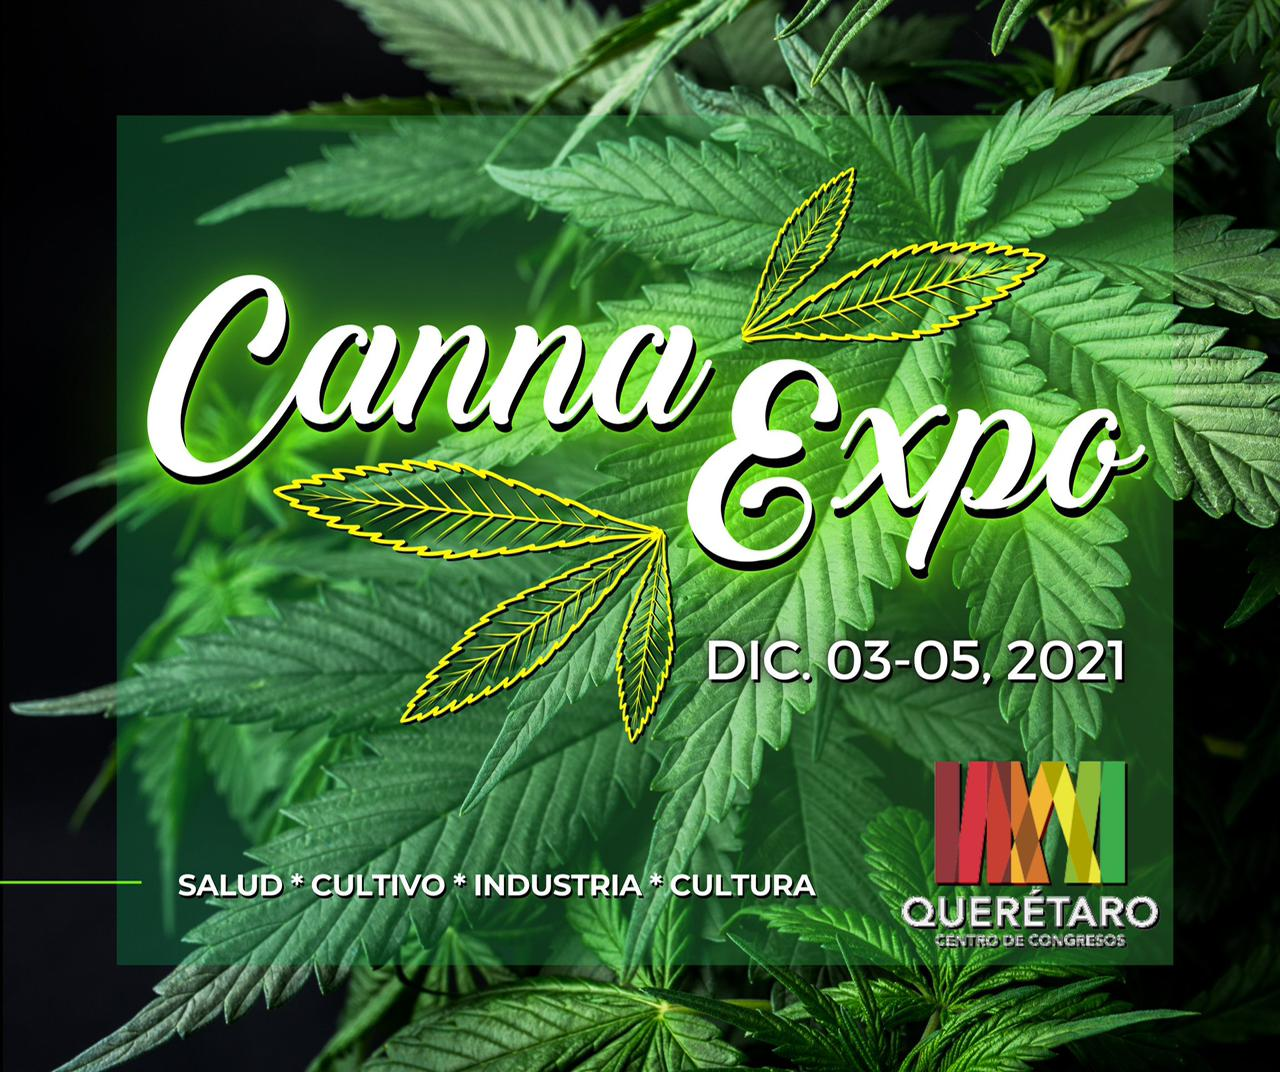 Querétaro recibirá Exposición de Cannabis en el mes de diciembre